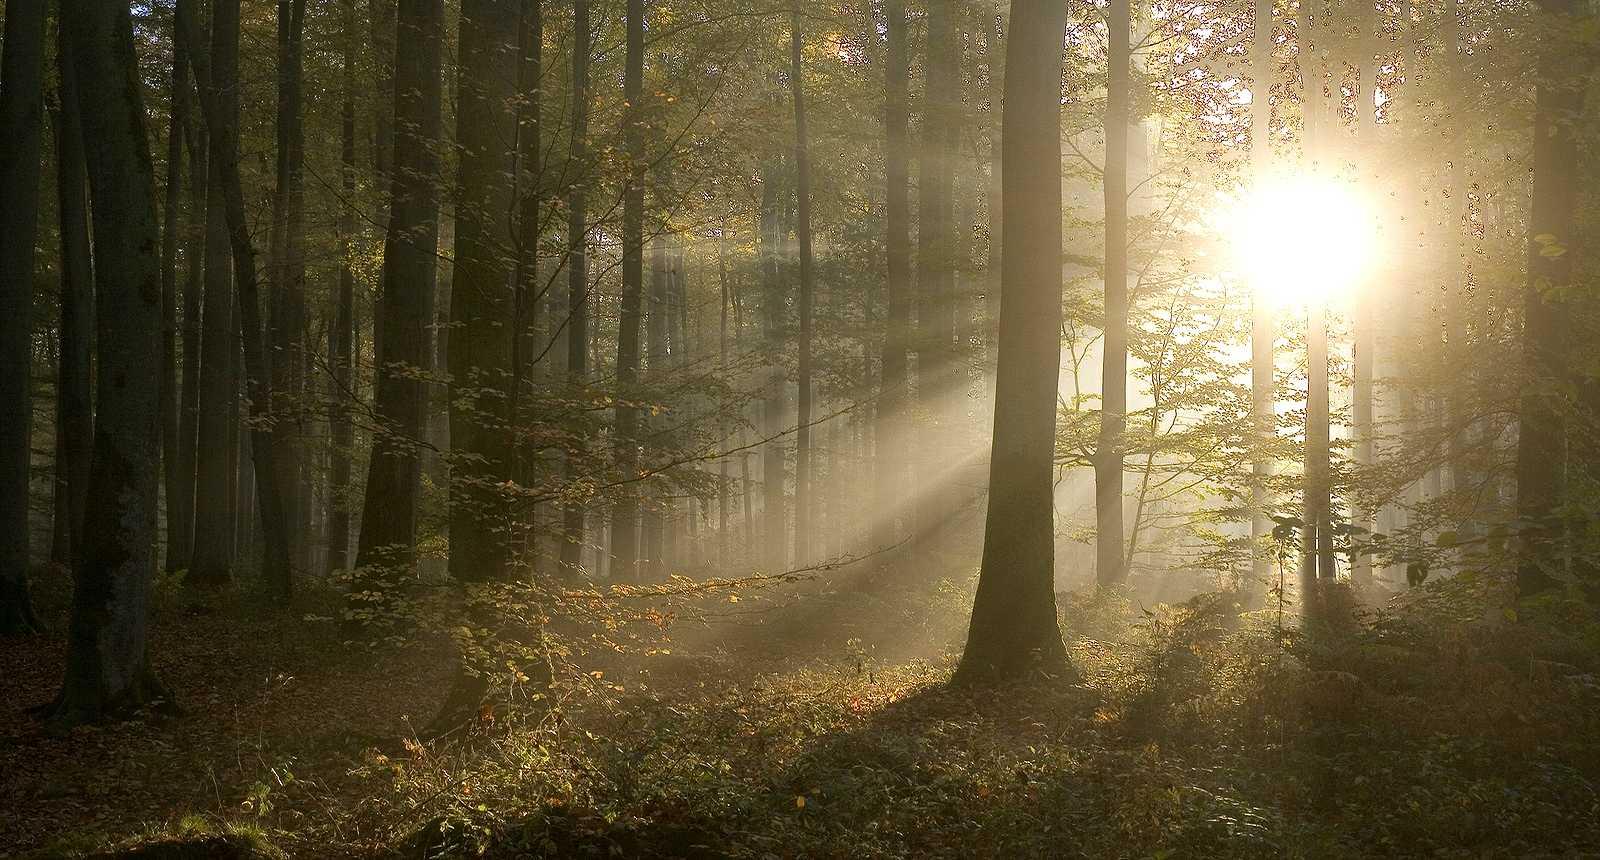 Image : Lyons-la-forêt